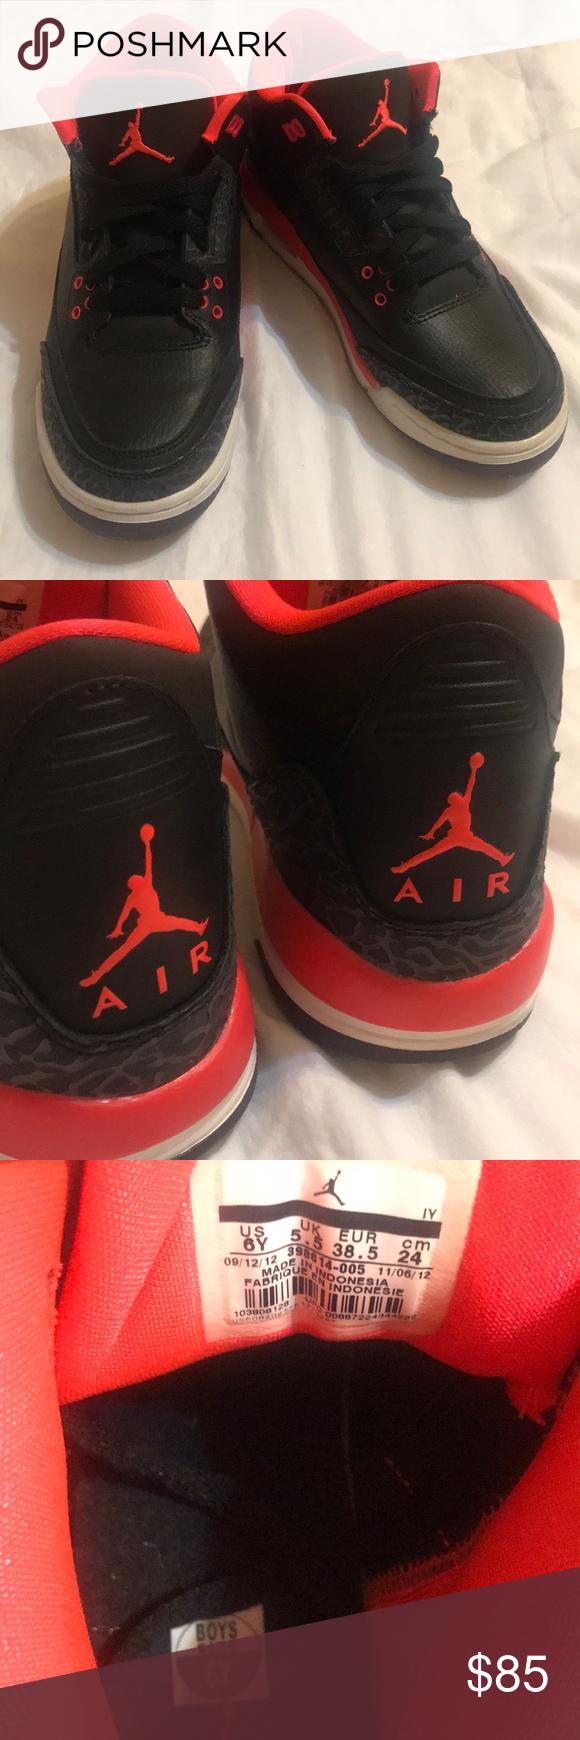 70f4286733d Nike Air Jordan Retro 3 Bright Crimson Boys Size 6 (I m a true 7 in ...